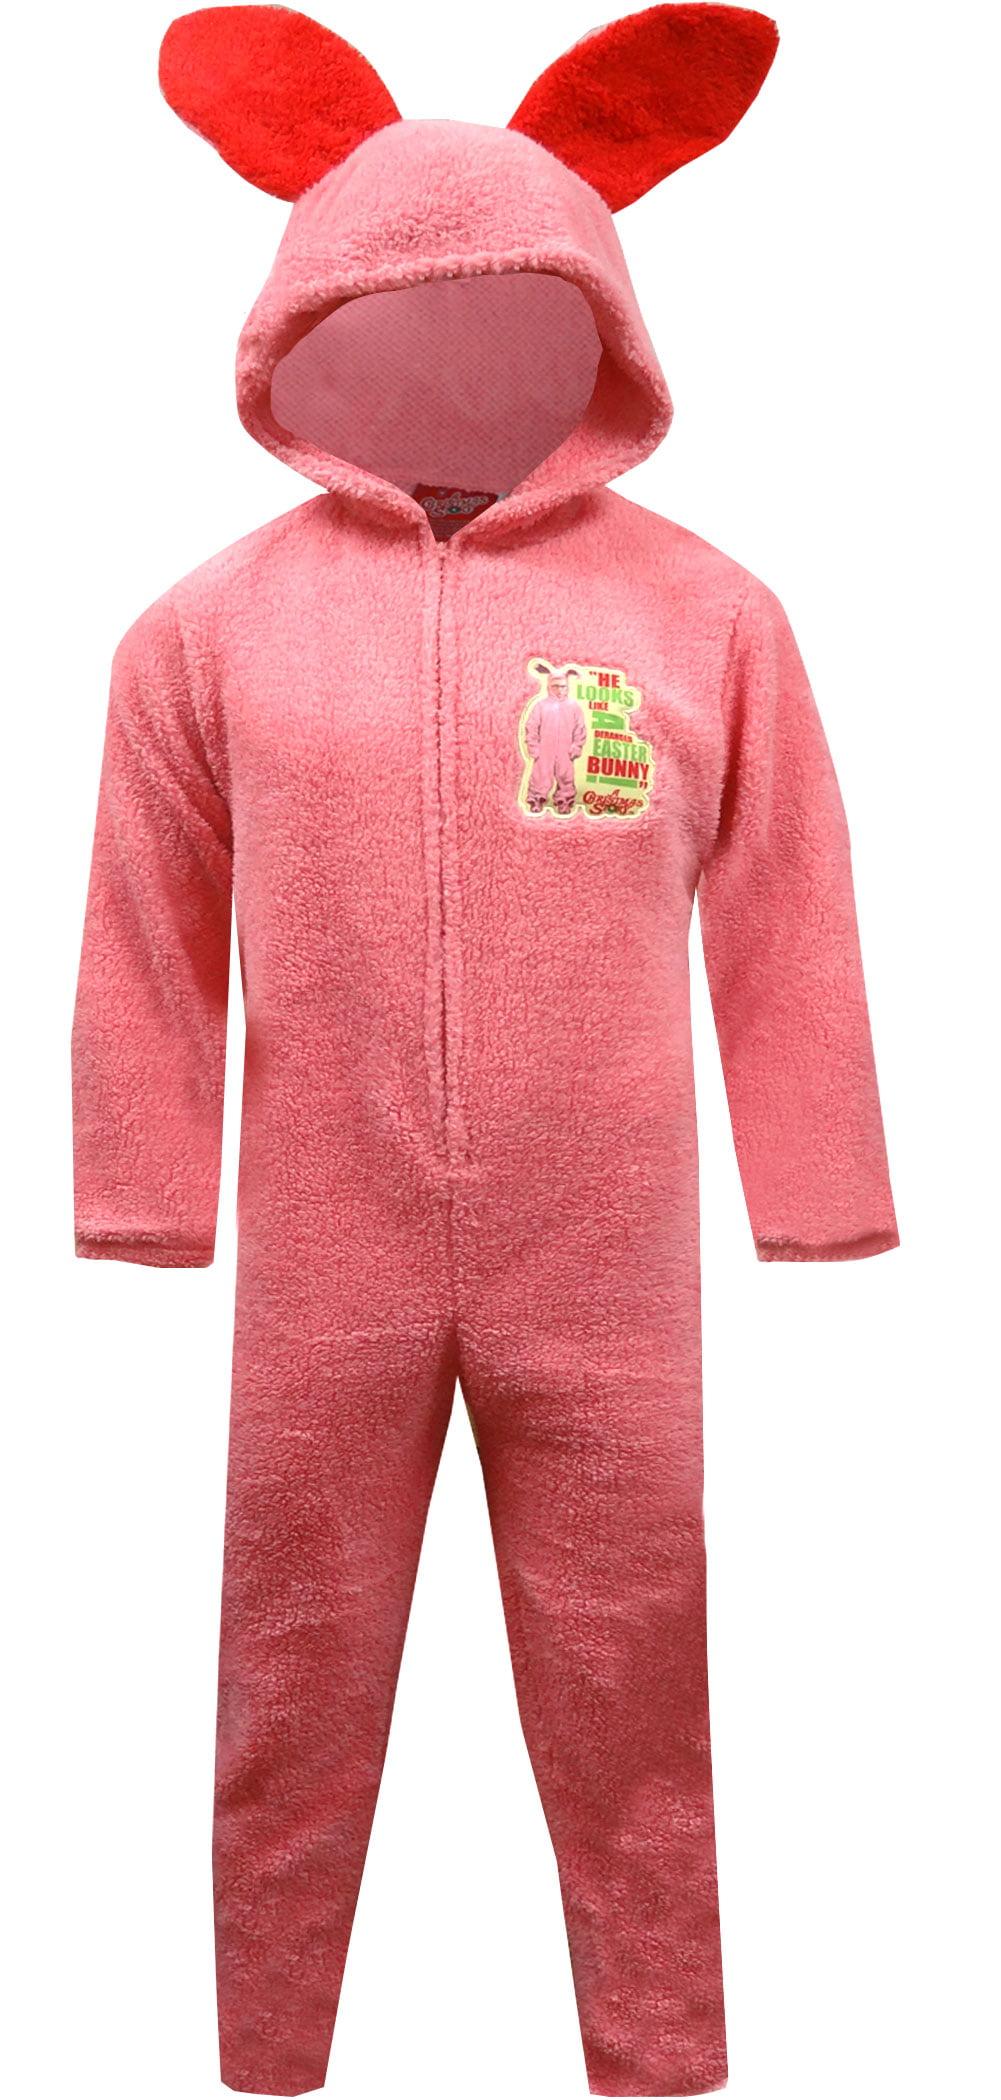 Christmas Story Unisex Pink Bunny Hooded Onesie Pajama - Walmart.com